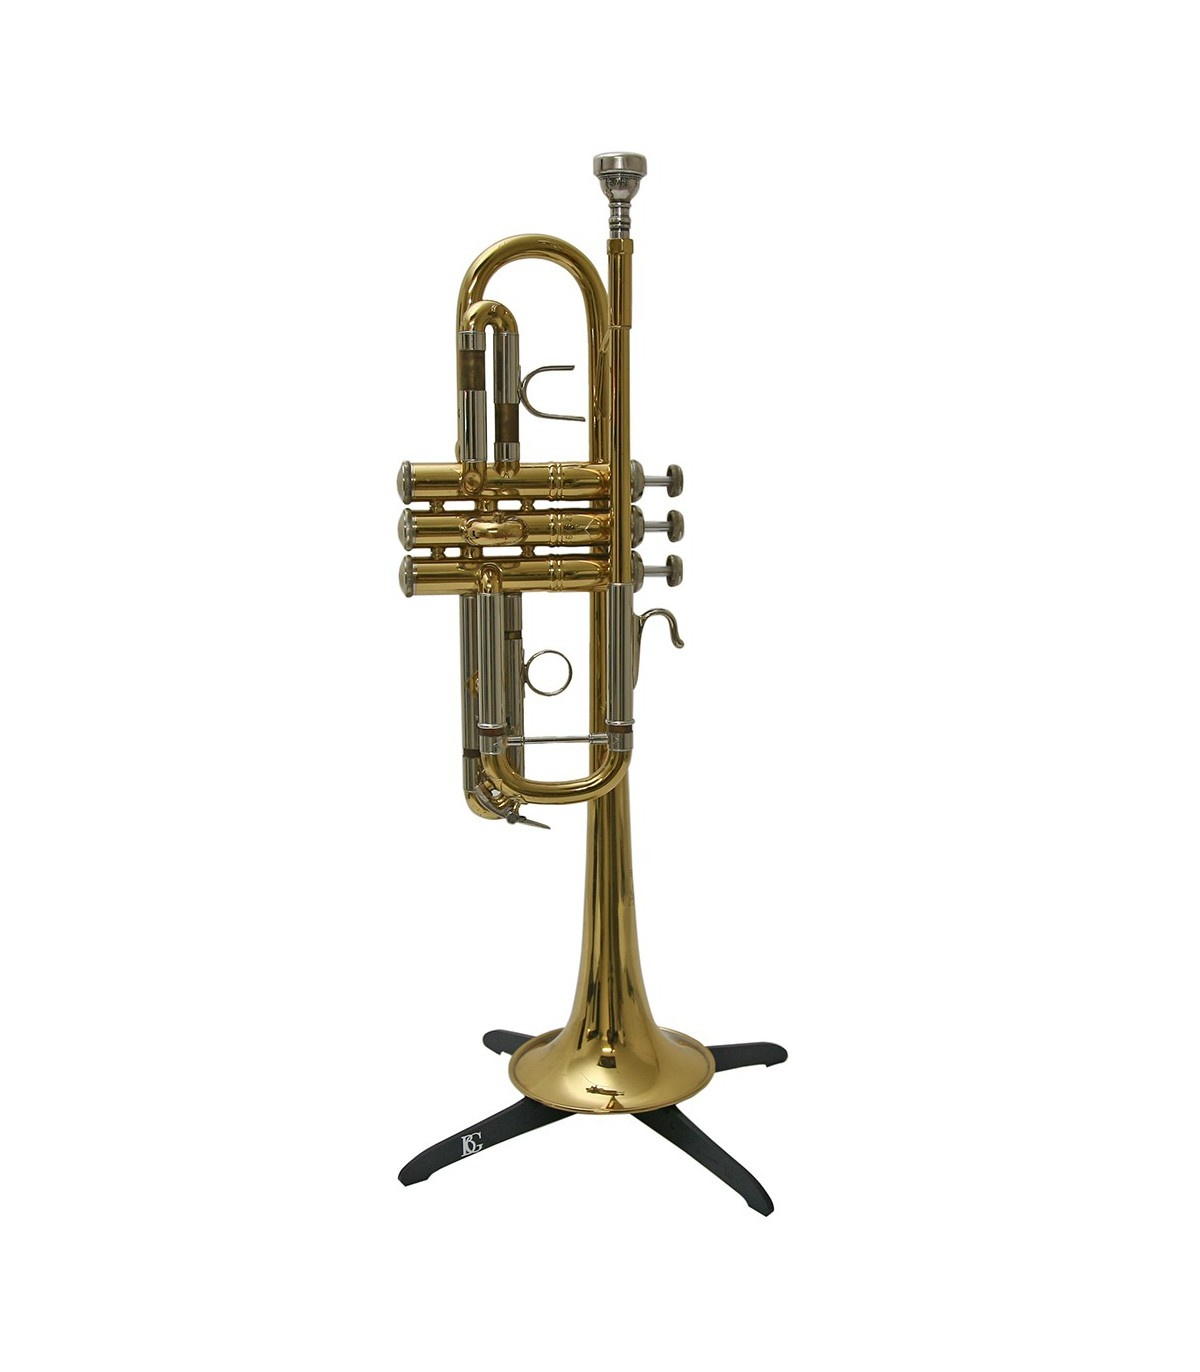 BG France BG A42 Stand for Trumpet, Cornet, Flugelhorn, Soprano Sax